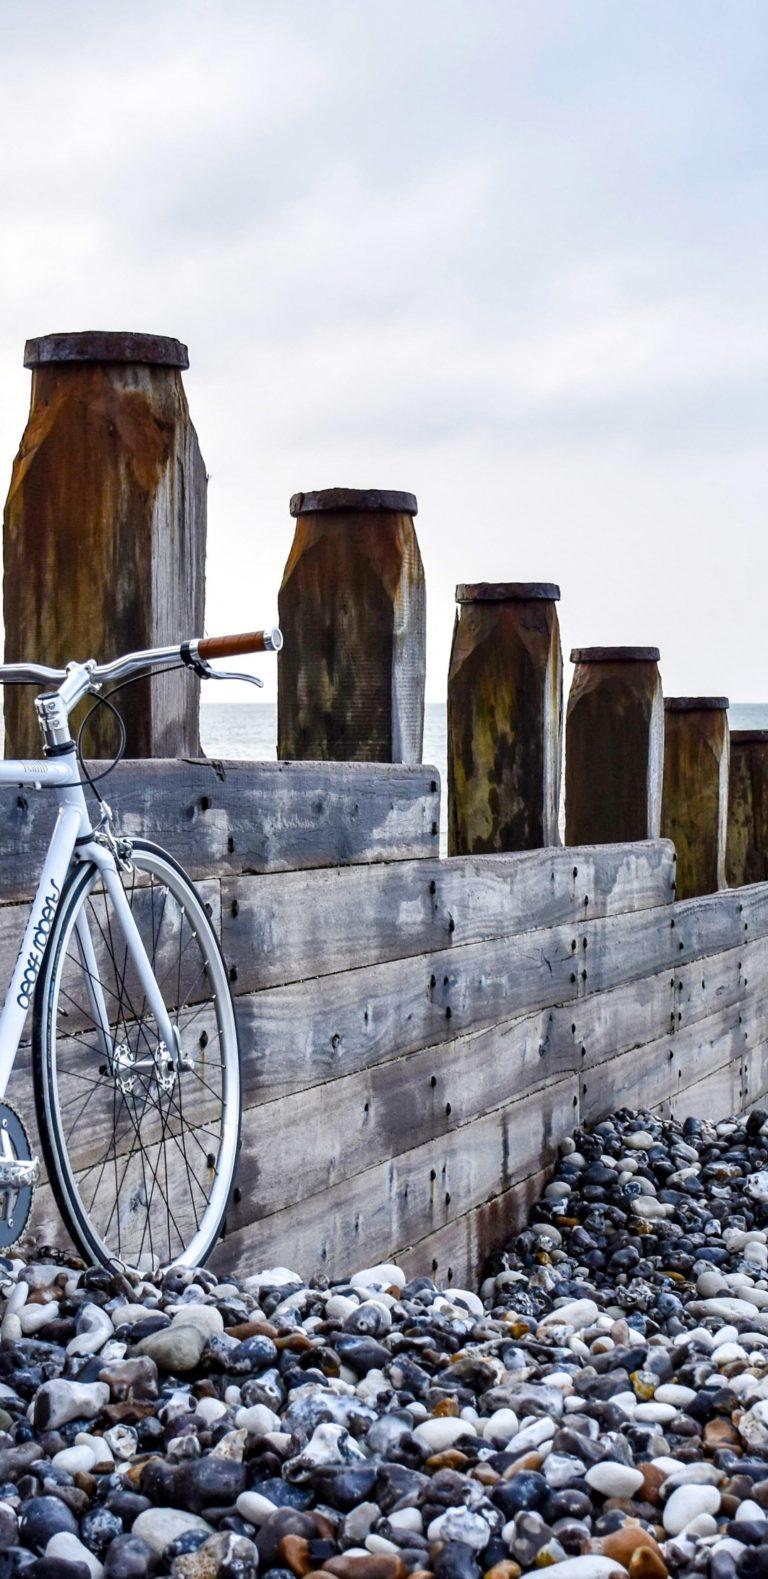 Beach Bicycle Bike Nature 1080x2220 768x1579